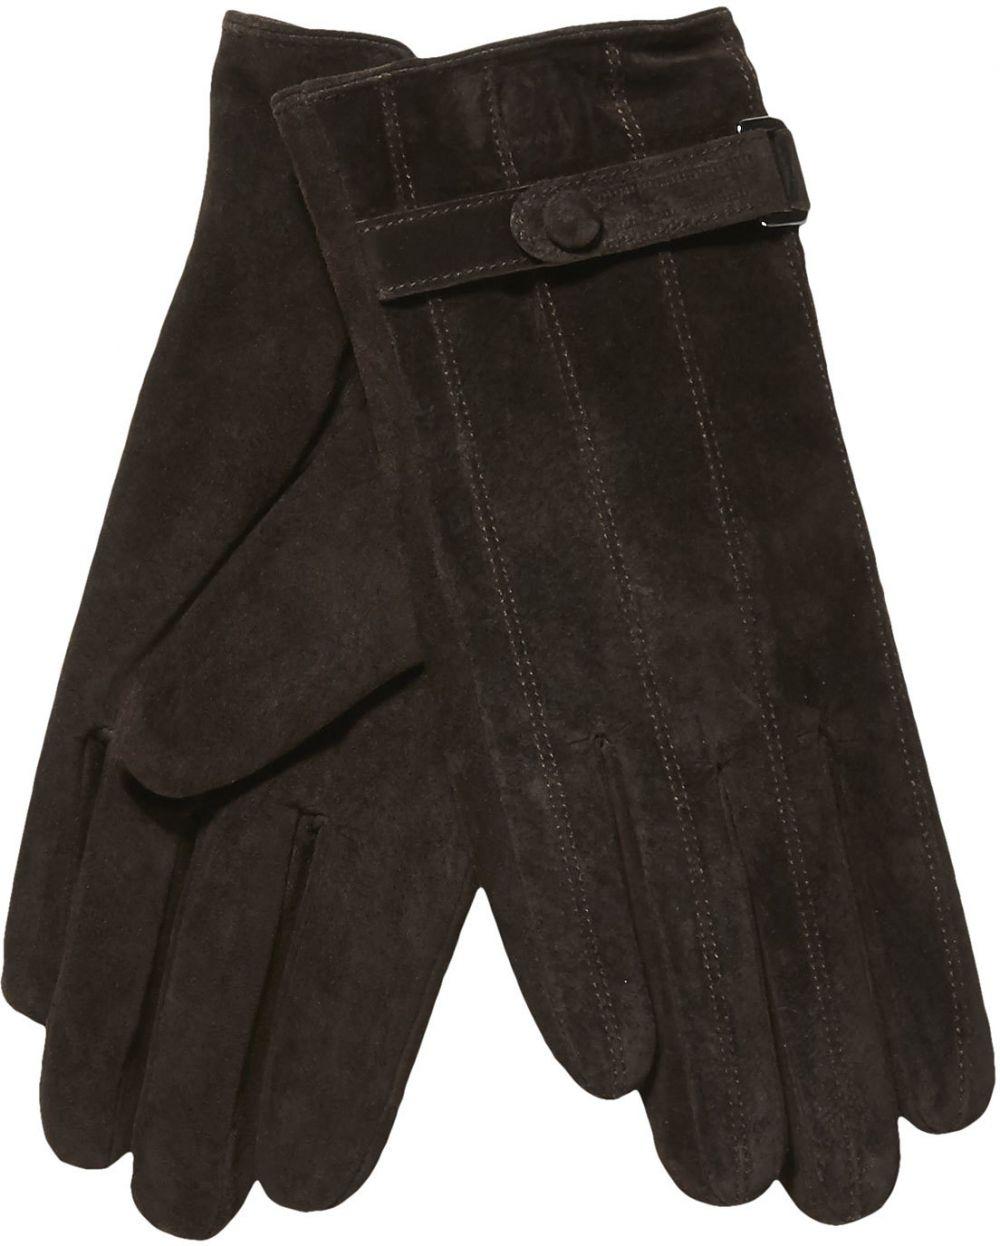 Kožené dámske rukavice s remienkom značky Baťa - Lovely.sk d623c22263